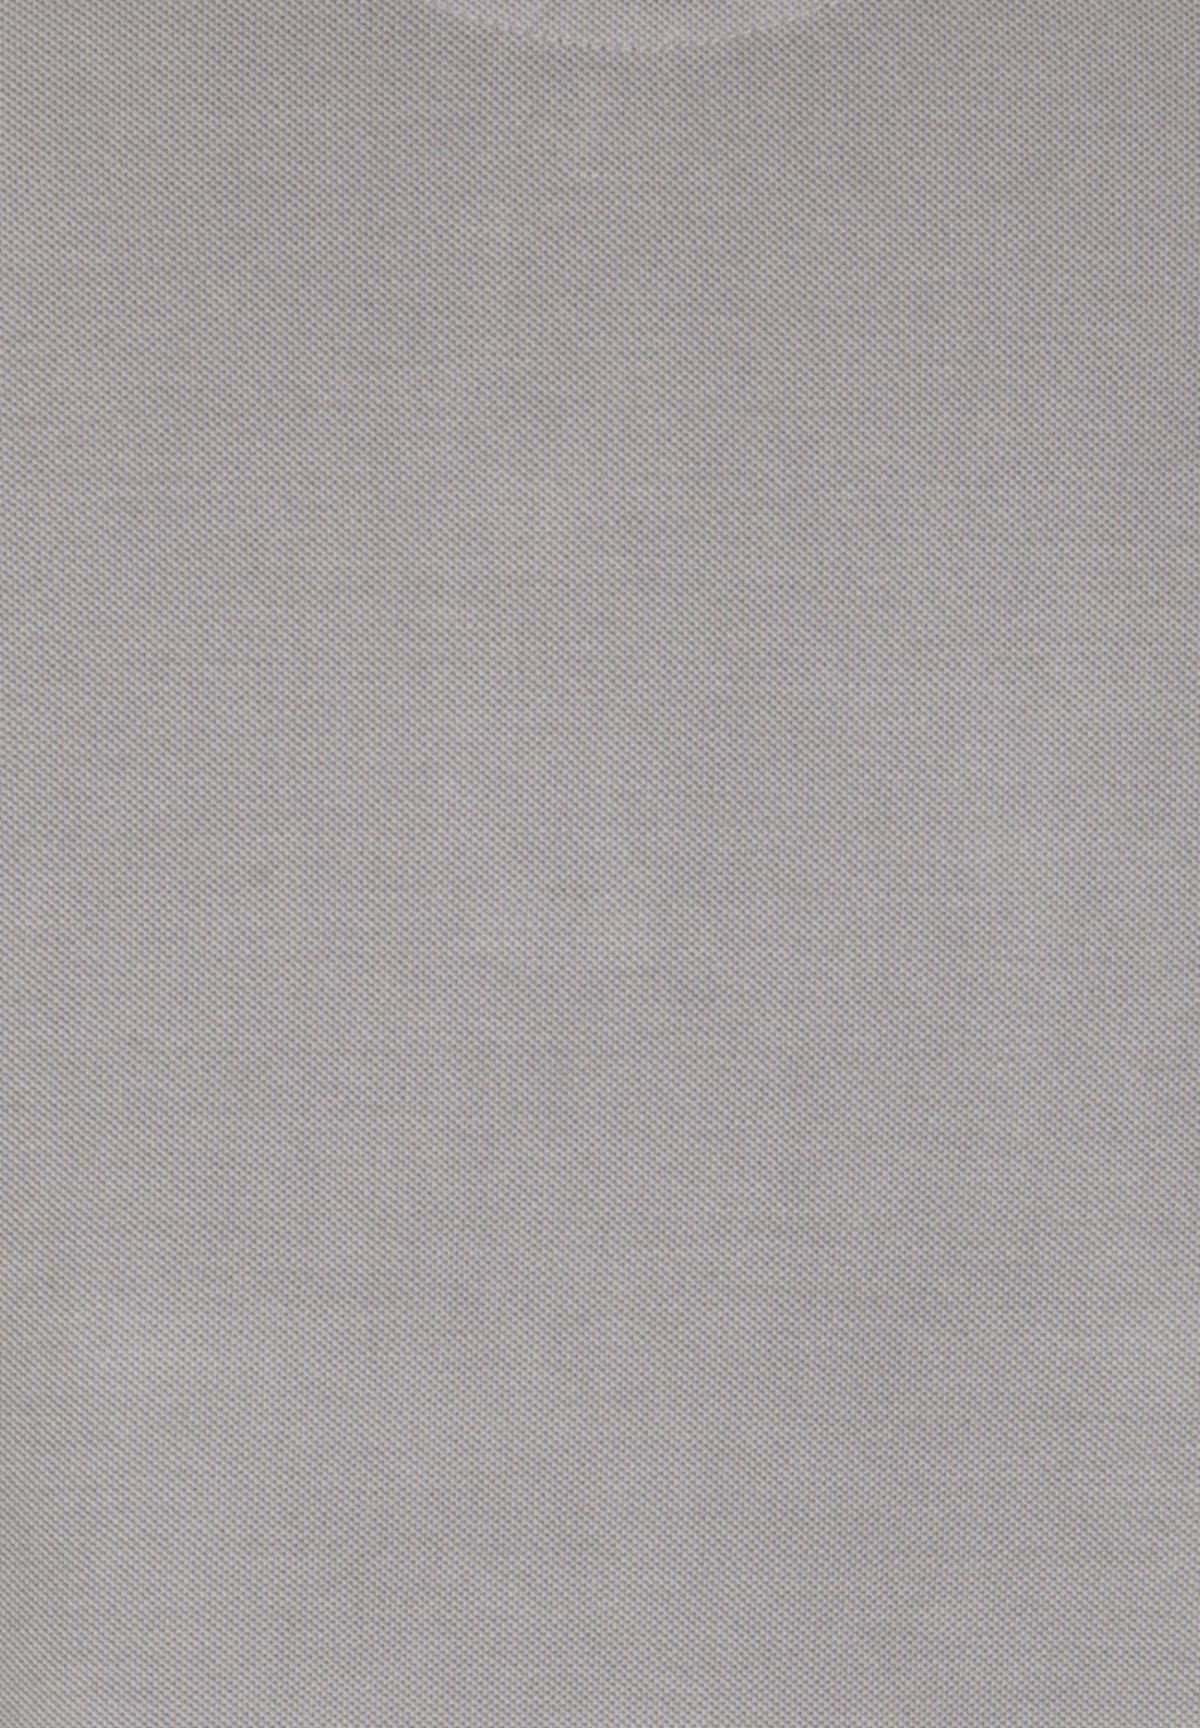 Camel-Active-Herren-Shirt-Poloshirt-Pique-Regular-Fit-NEU Indexbild 41